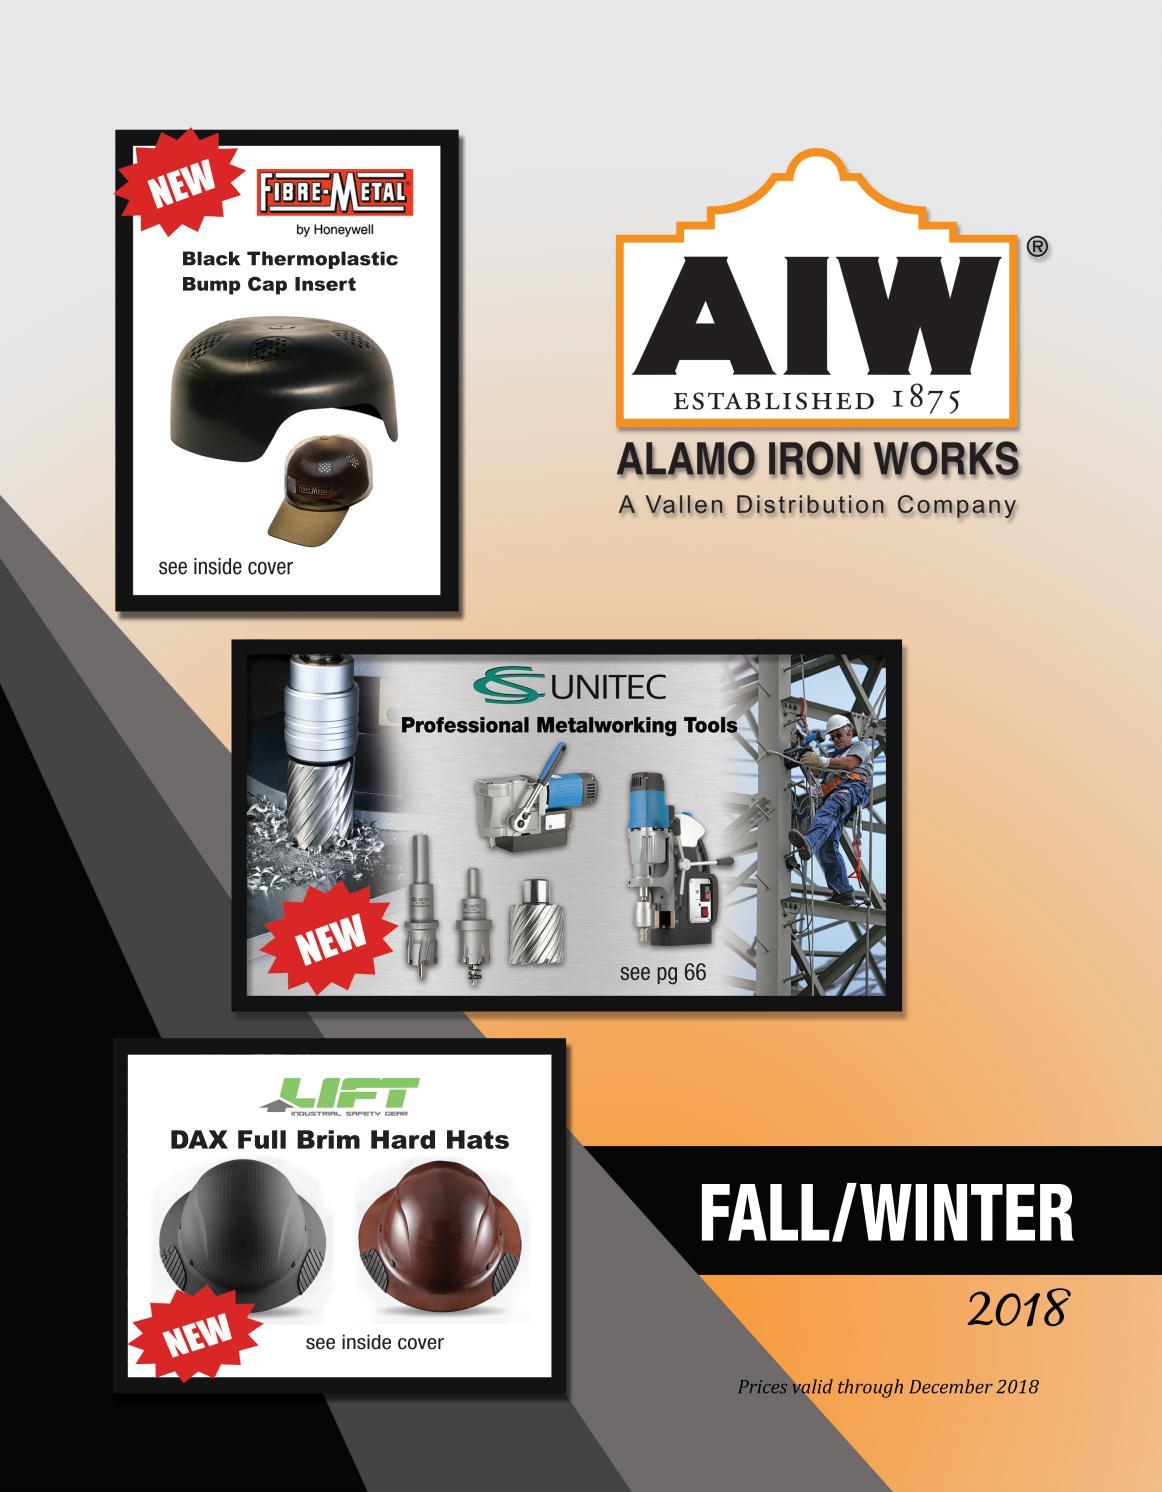 Stainless Steel SUPERTOOL 1 Pair Lift Up、Flap Top Hinge, Spring Hinge Industry Standard Heavy Duty for Door//Kitchen Cupboard//Cabinet